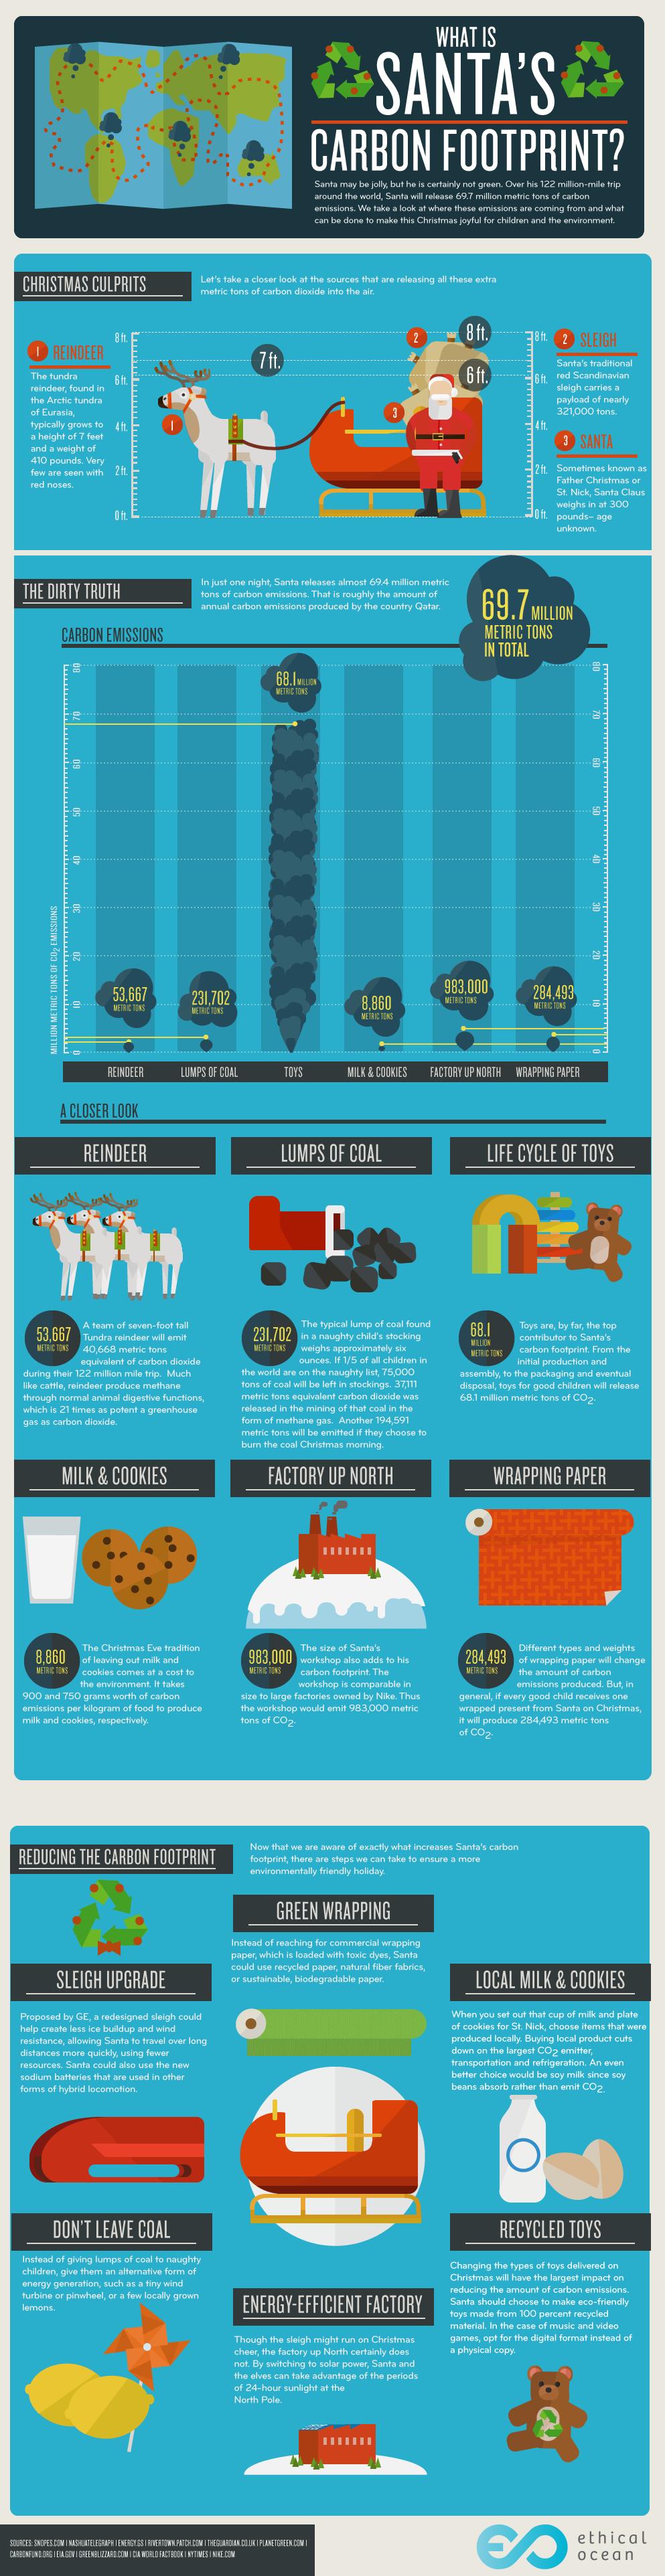 Santa's carbon footprint.